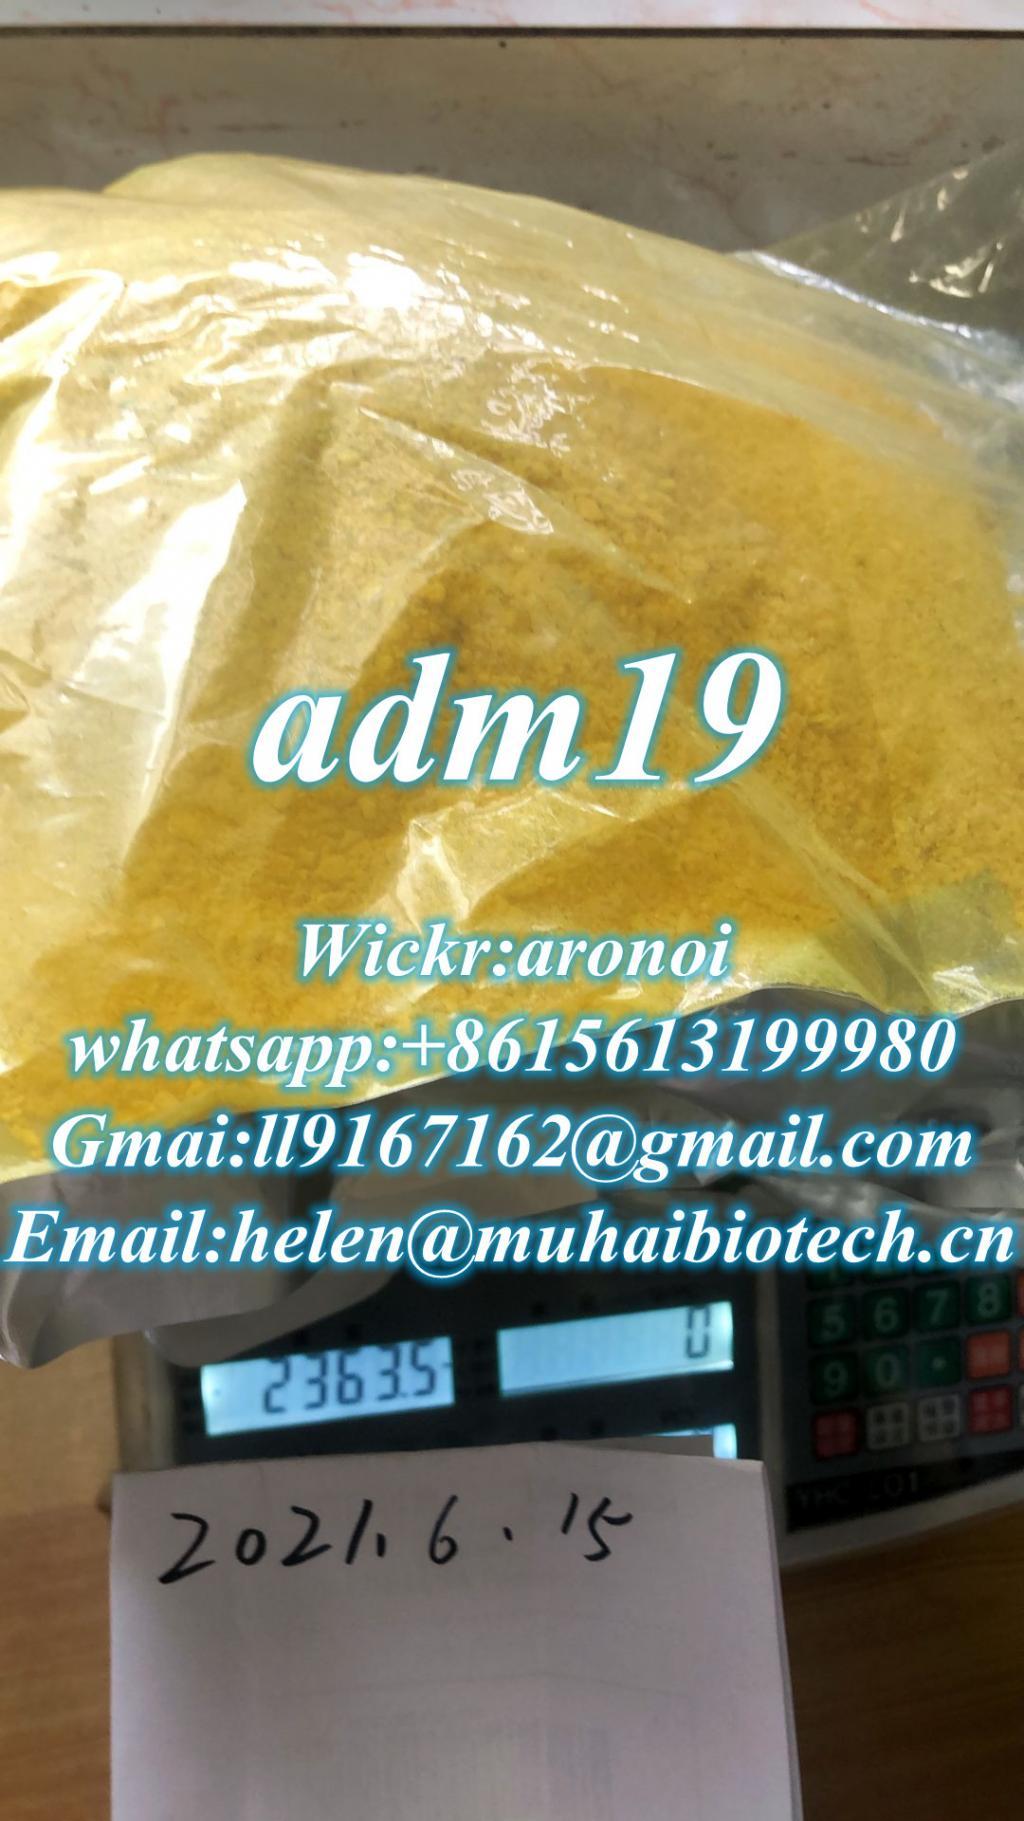 ad-18 ad18 adbb 2fdck best price wickr:aronoi